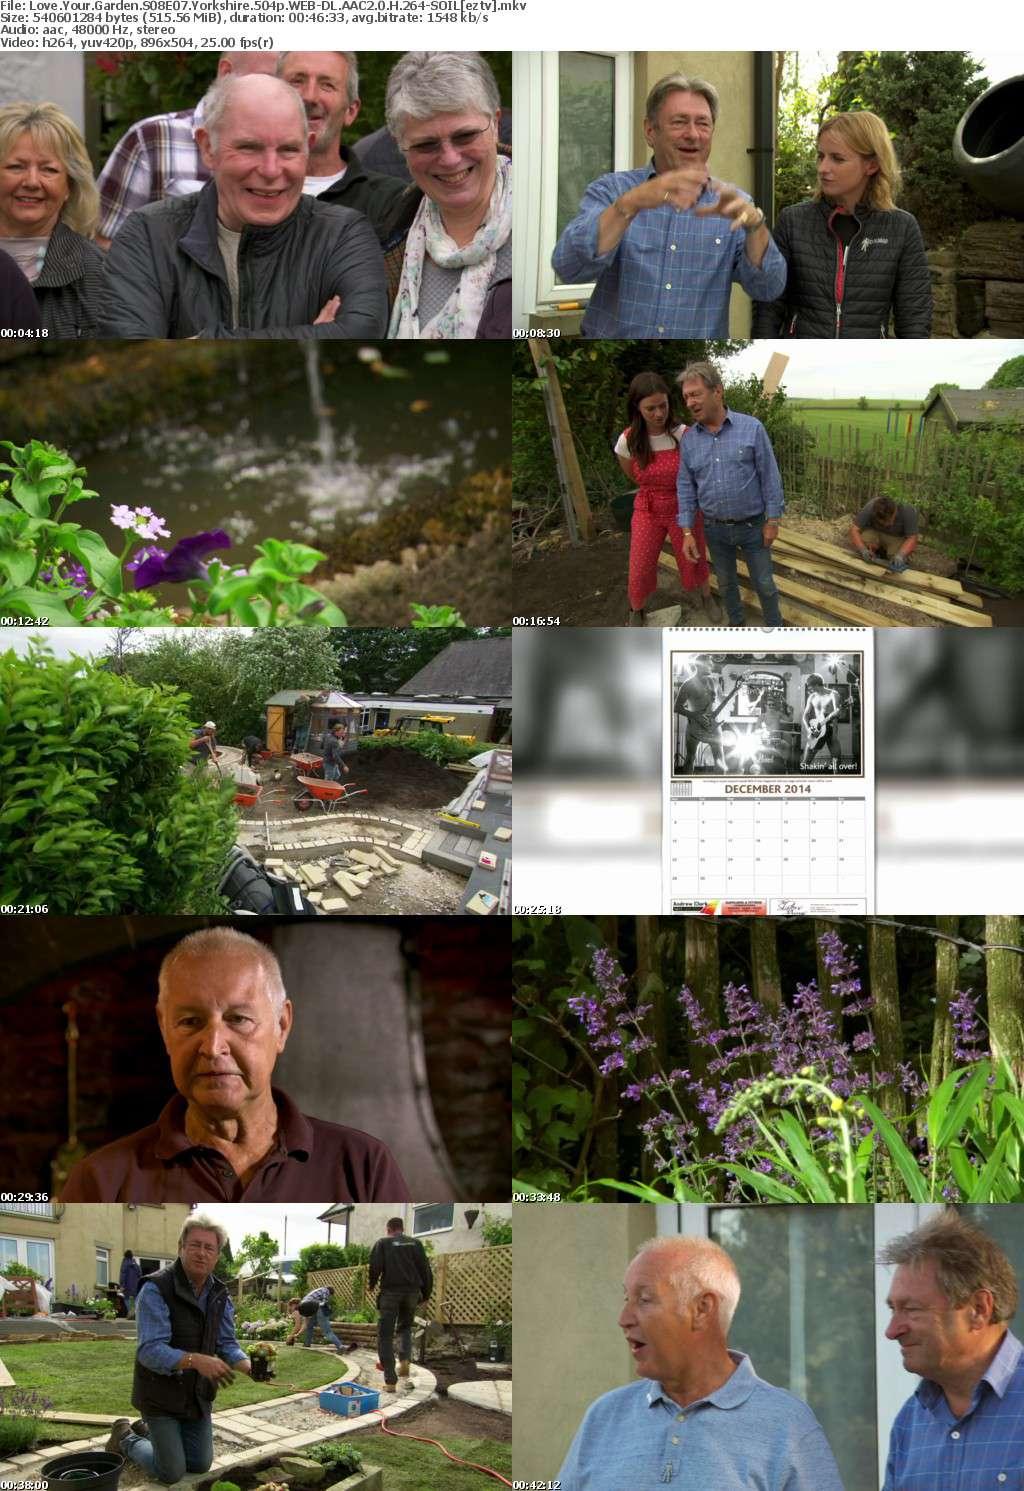 Love Your Garden S08E07 Yorkshire 504p WEB-DL AAC2.0 H264-SOIL